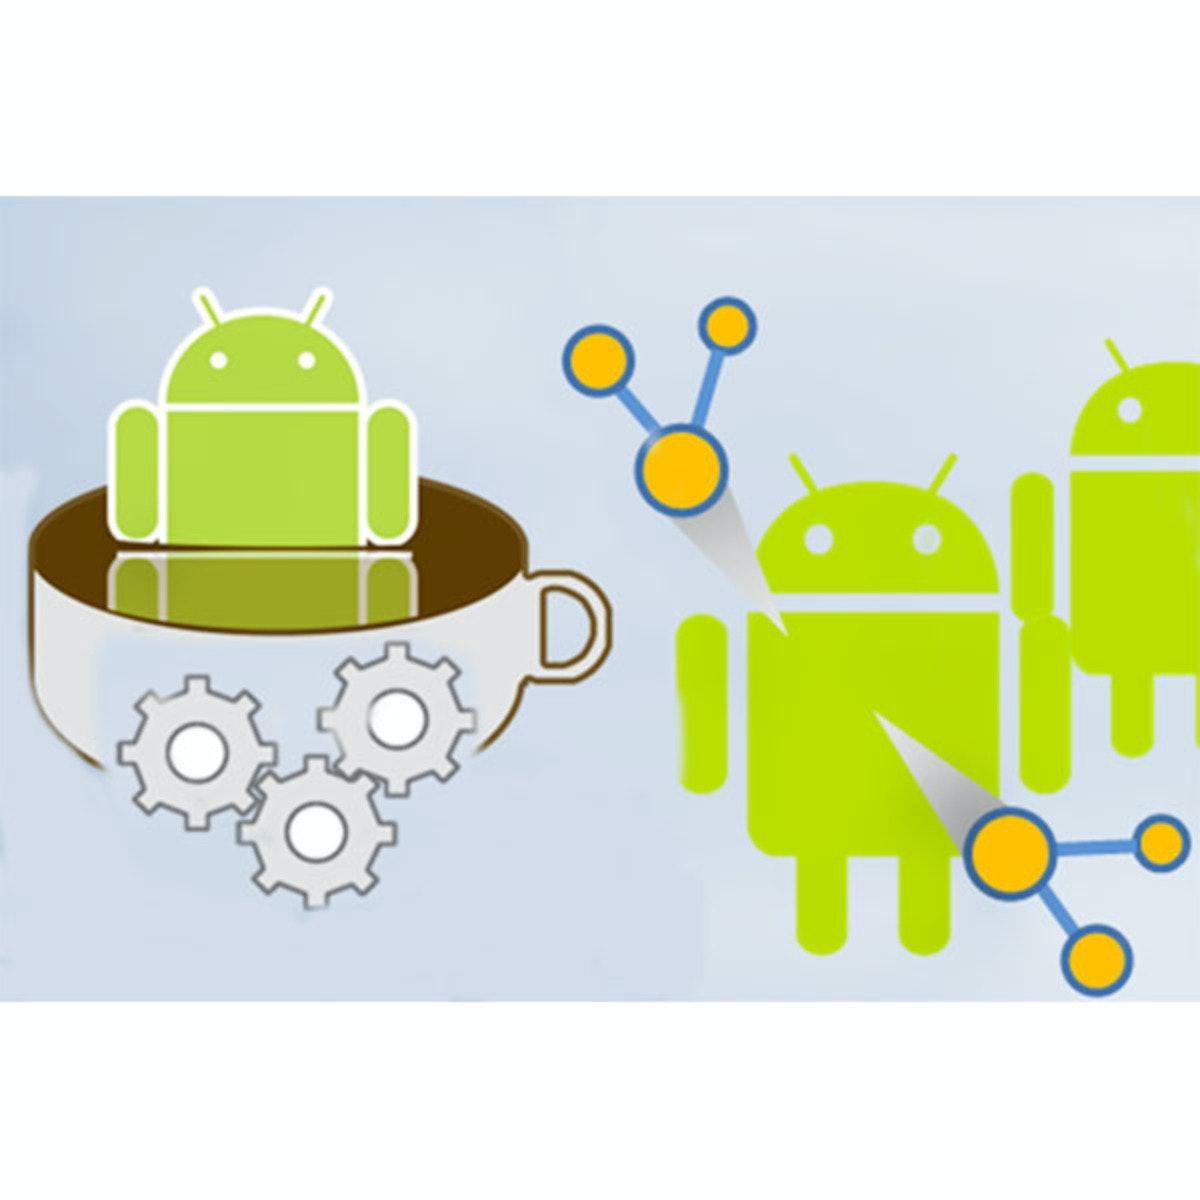 "Capstone MOOC for \""Android App Development"